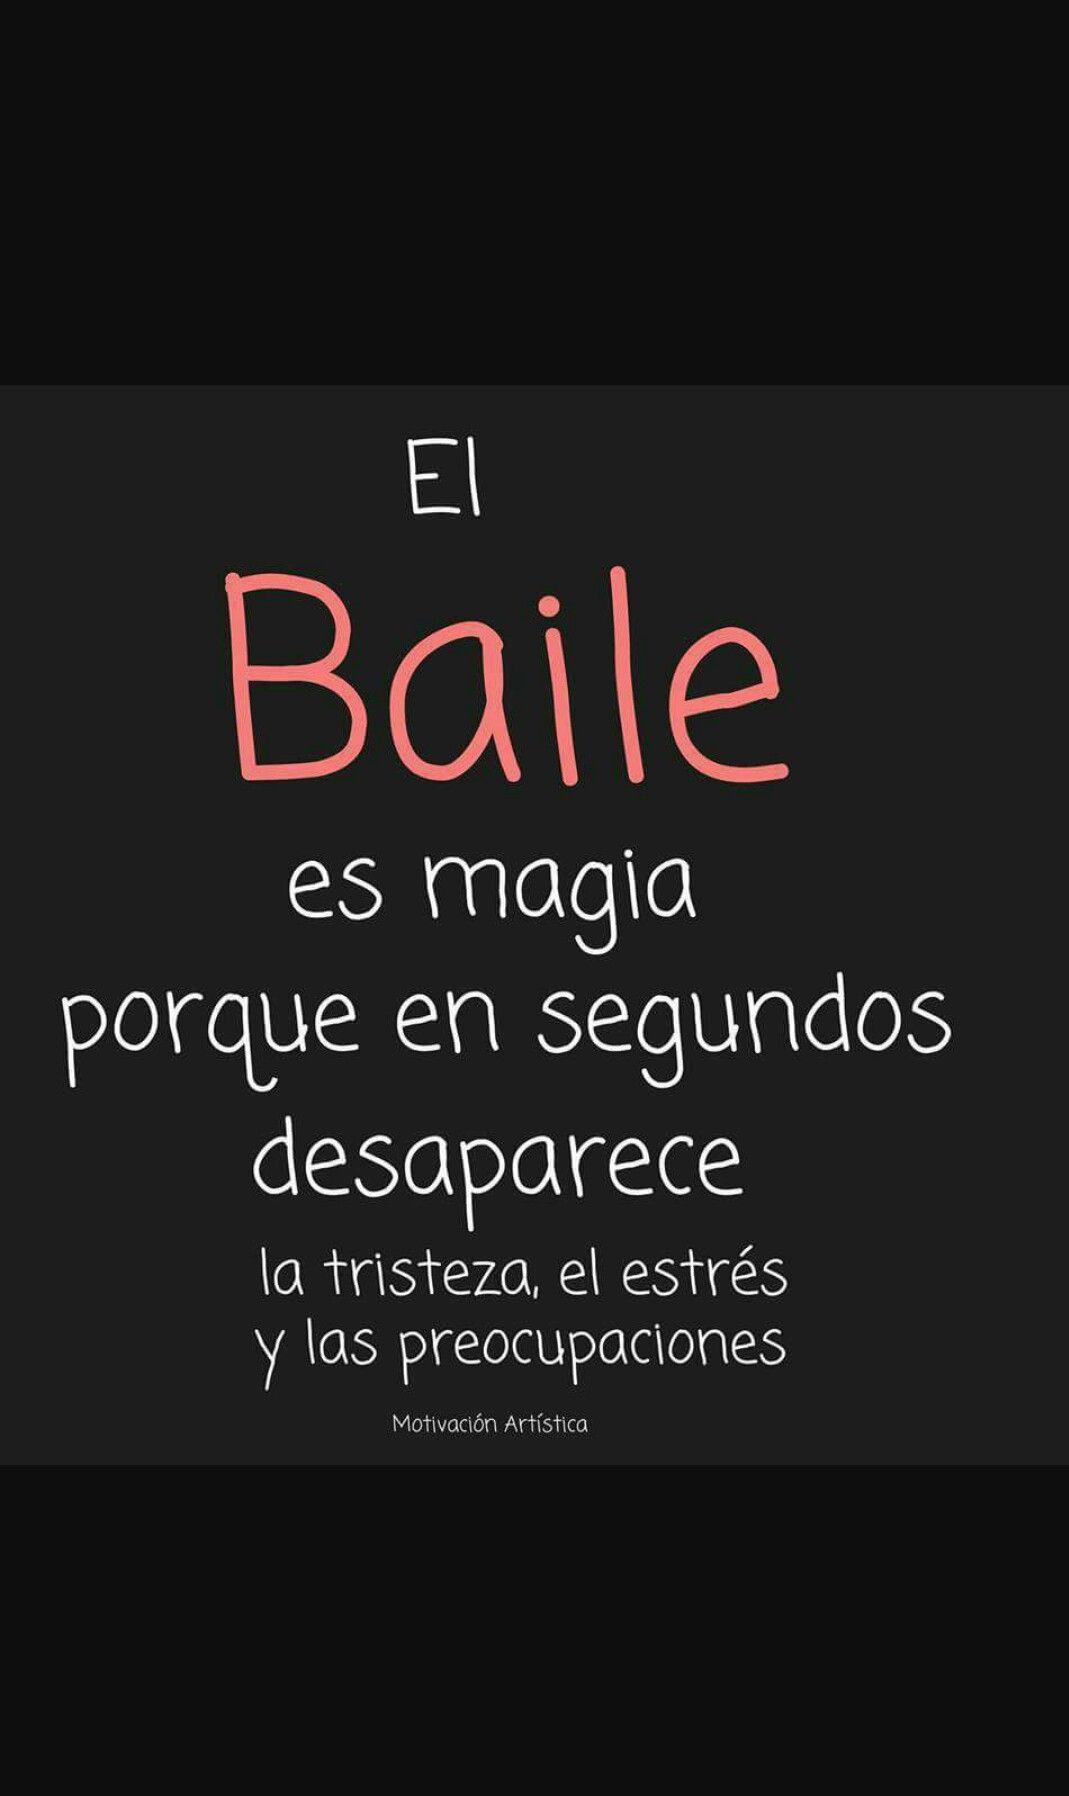 Danza Frases De Danza Frases De Baile Y Frases De